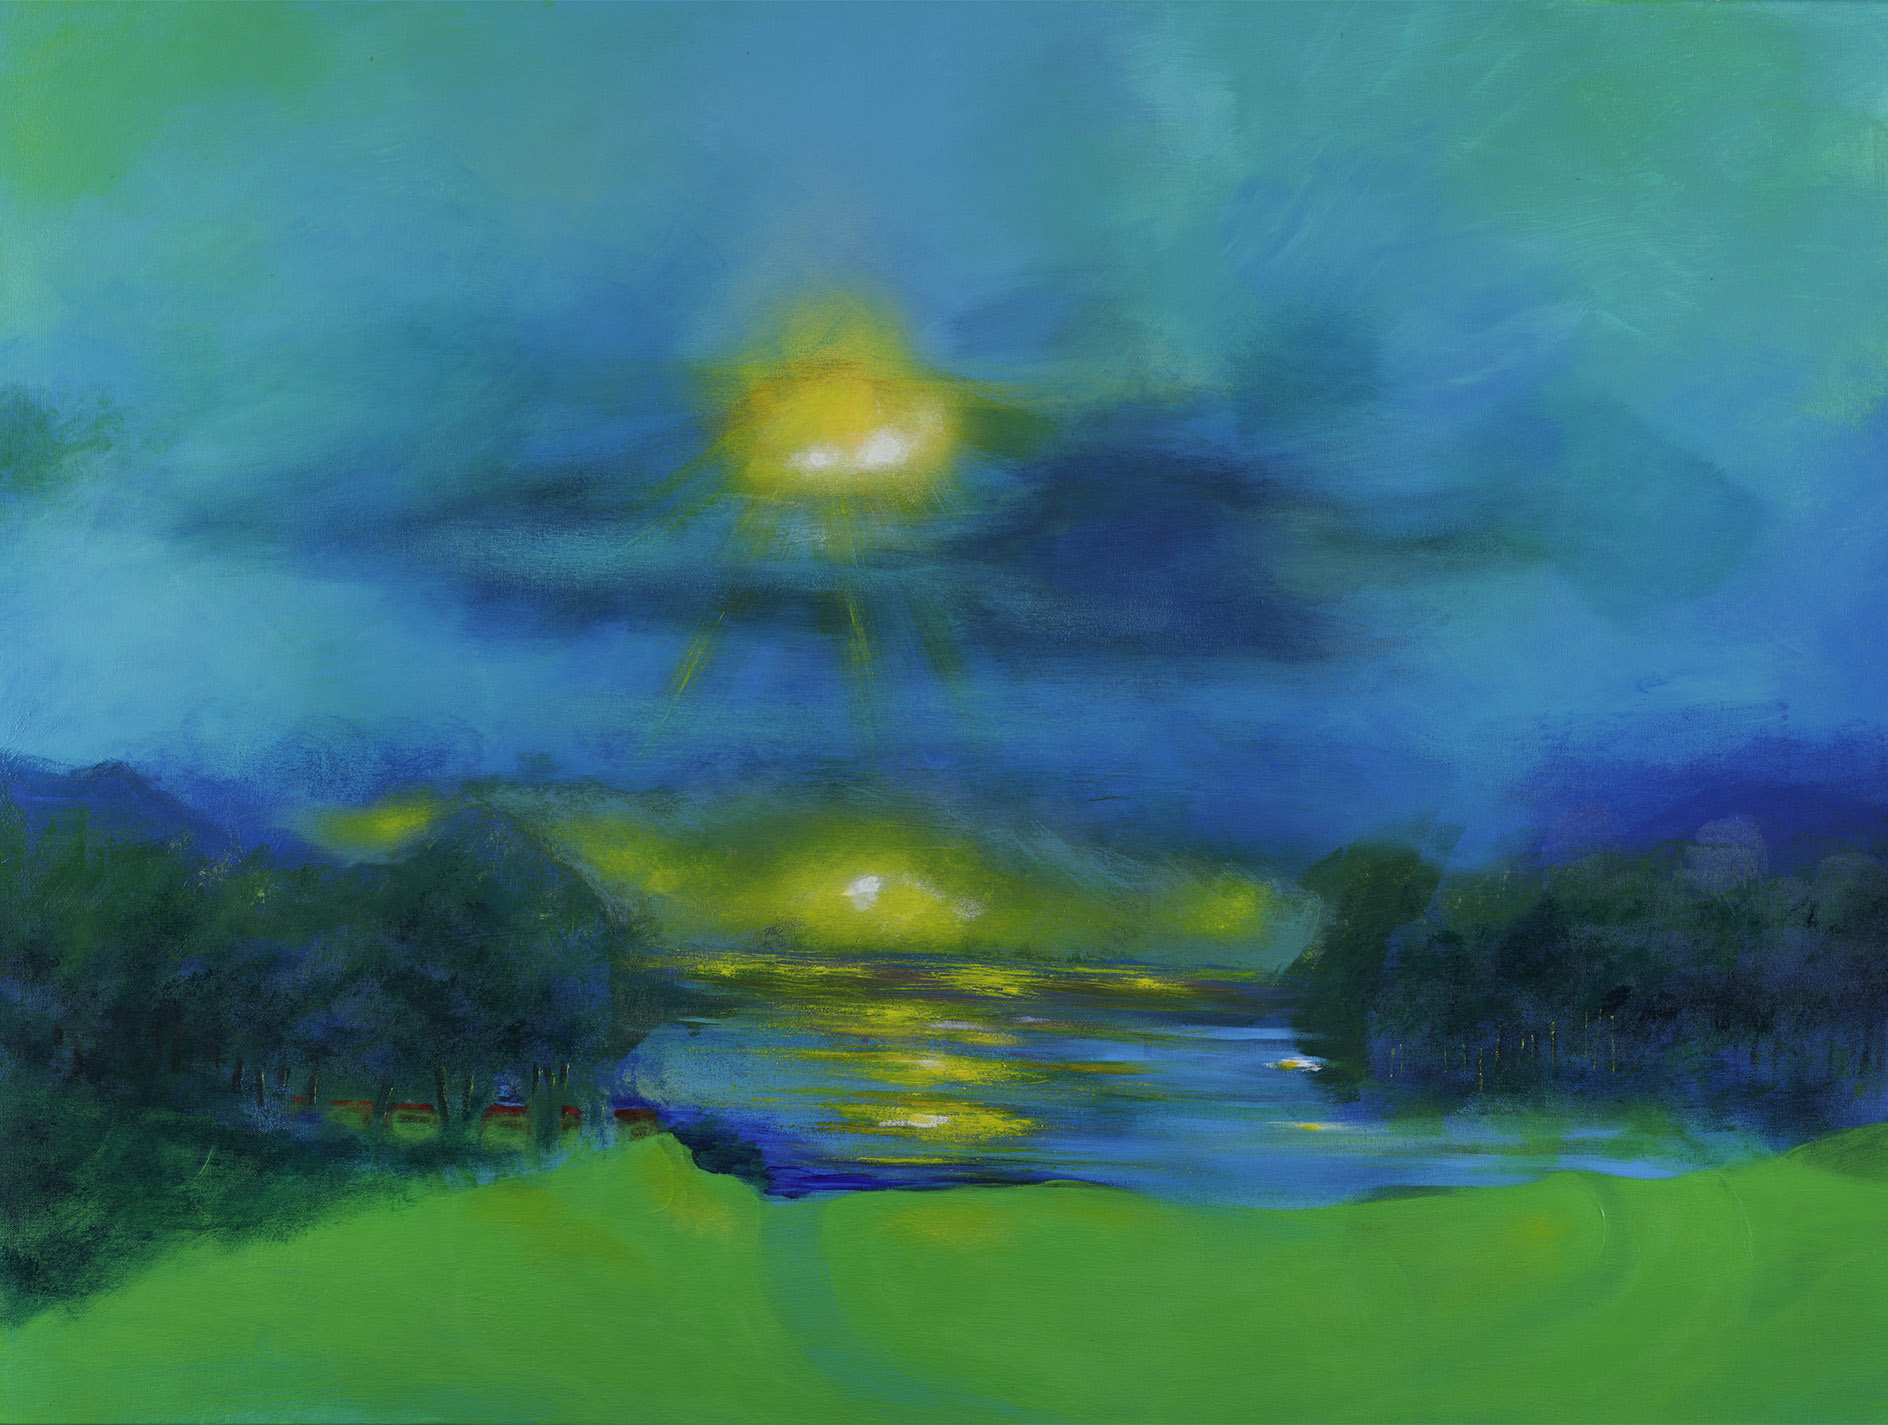 Healing Horizons - 36 x 48 inch Acrylic on Canvas